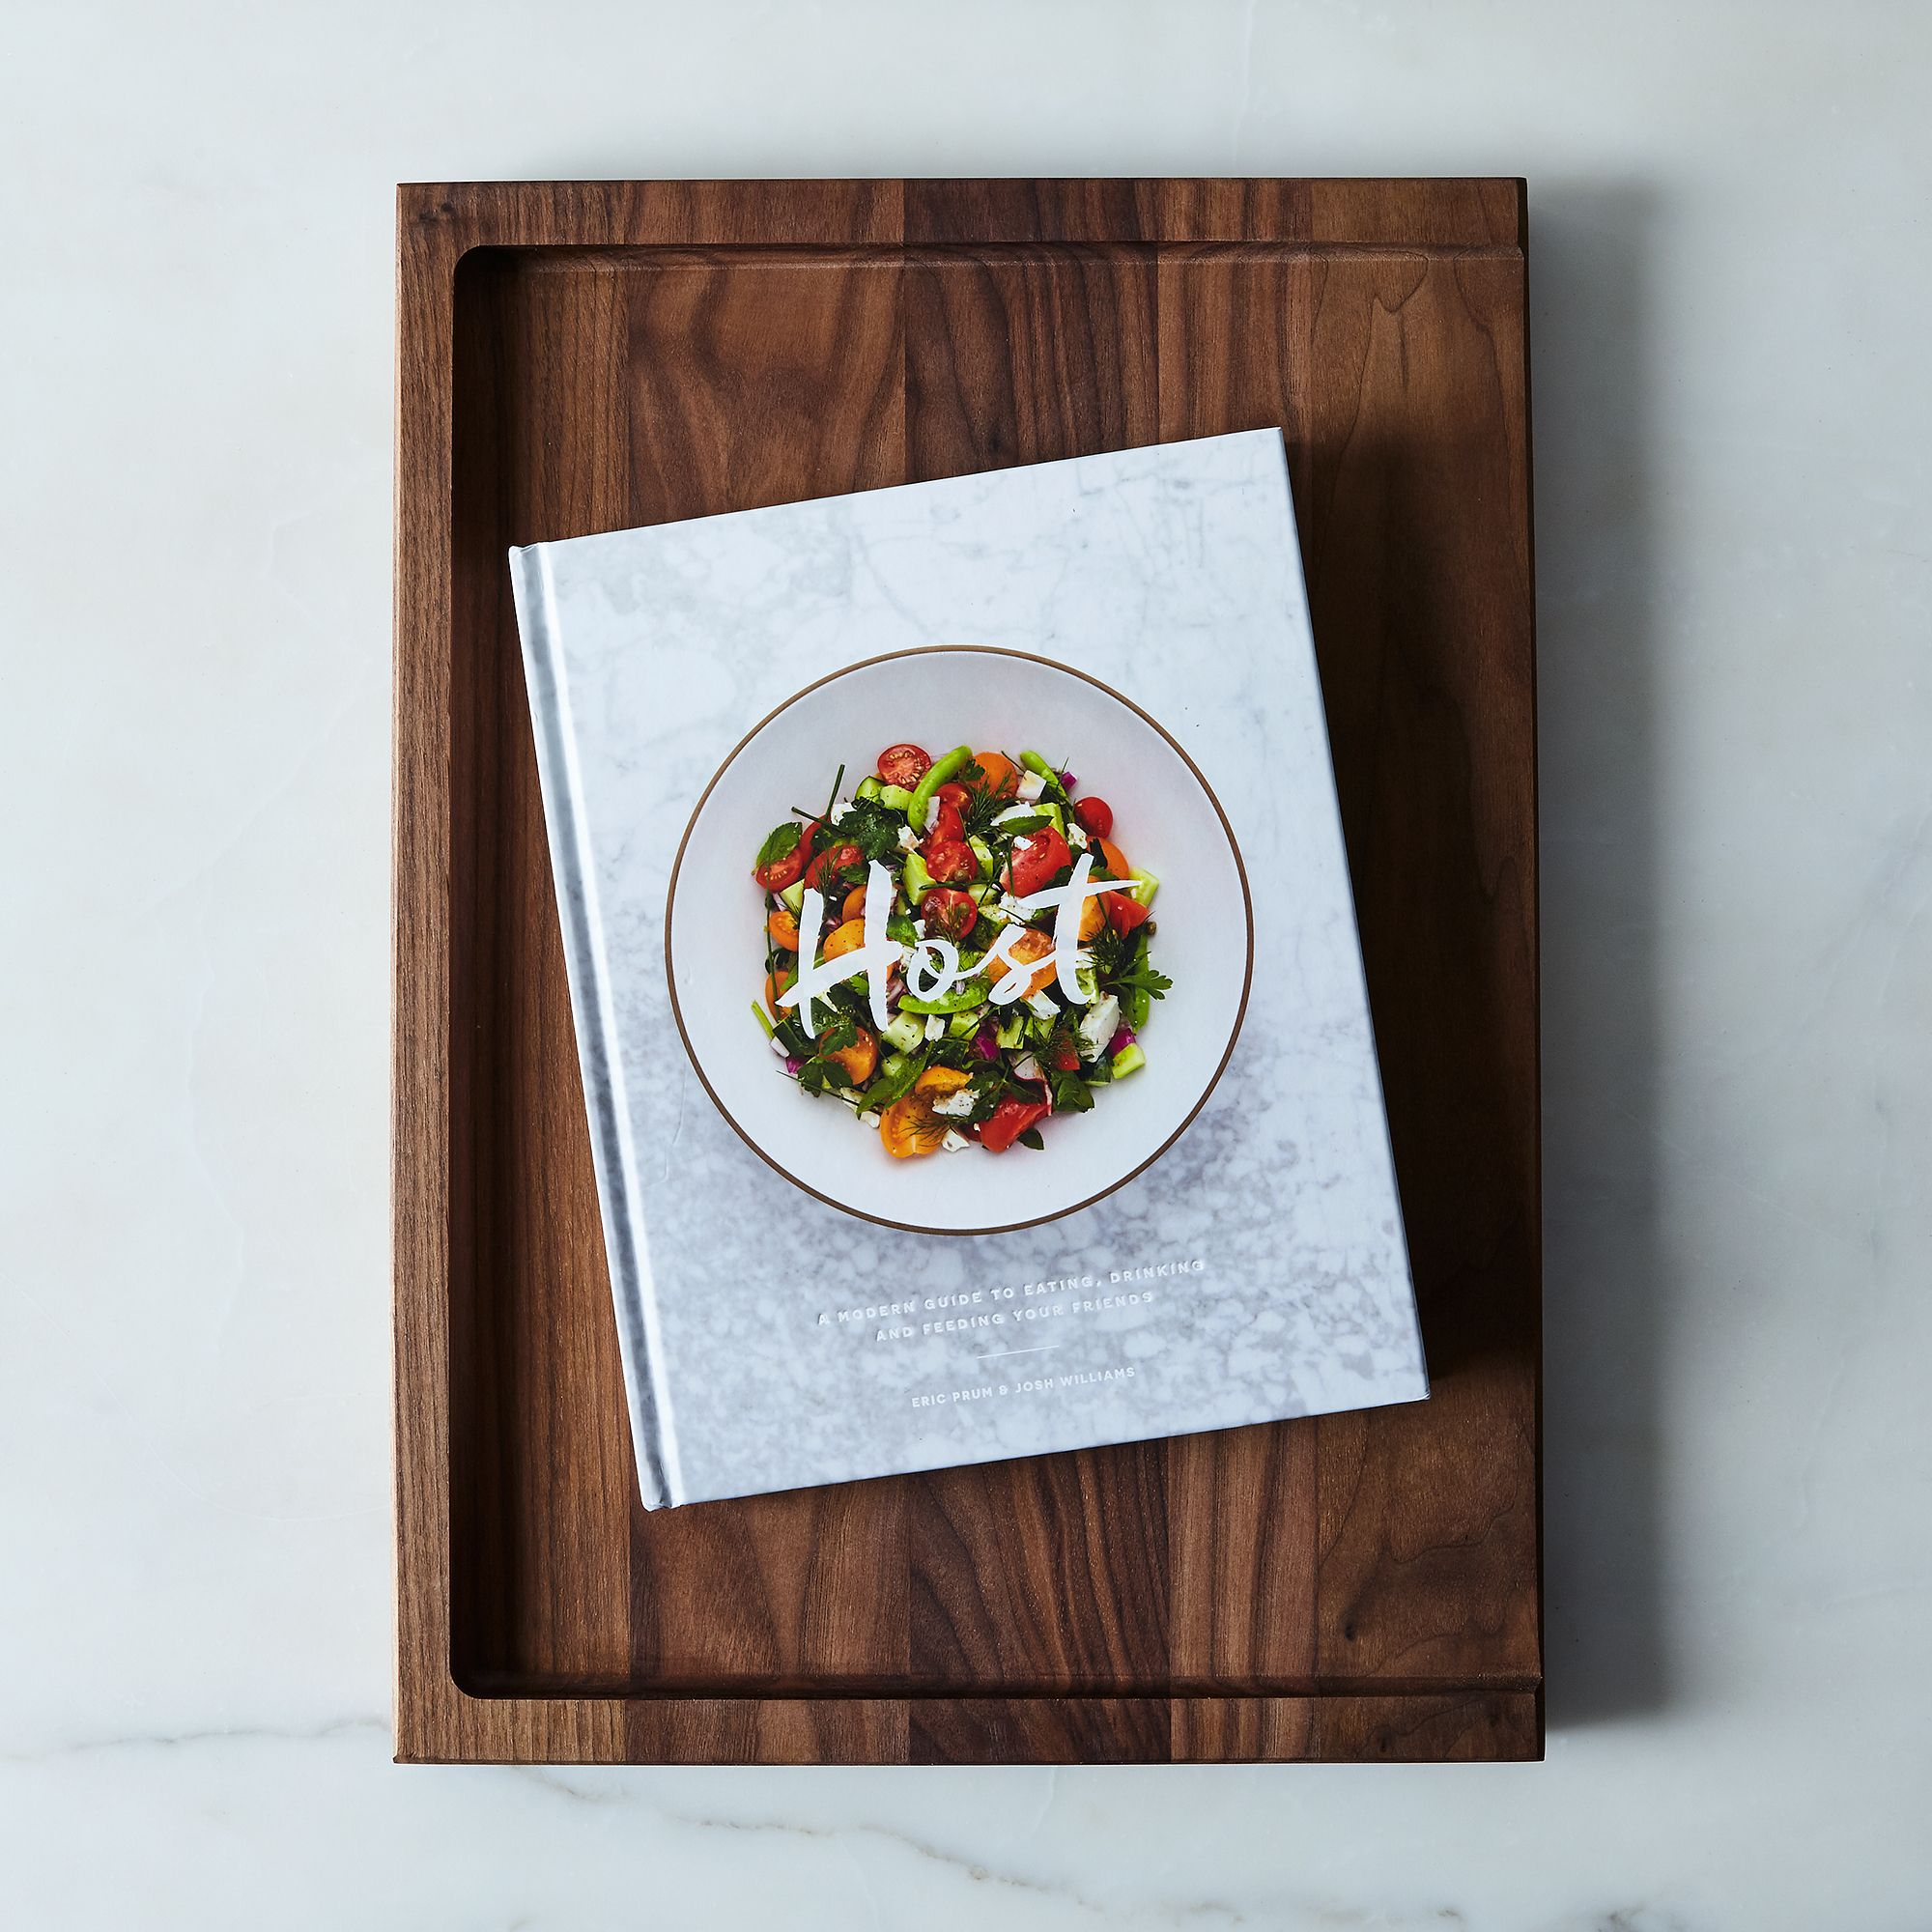 Host Cookbook & Walnut Cutting Board Host Gift Set